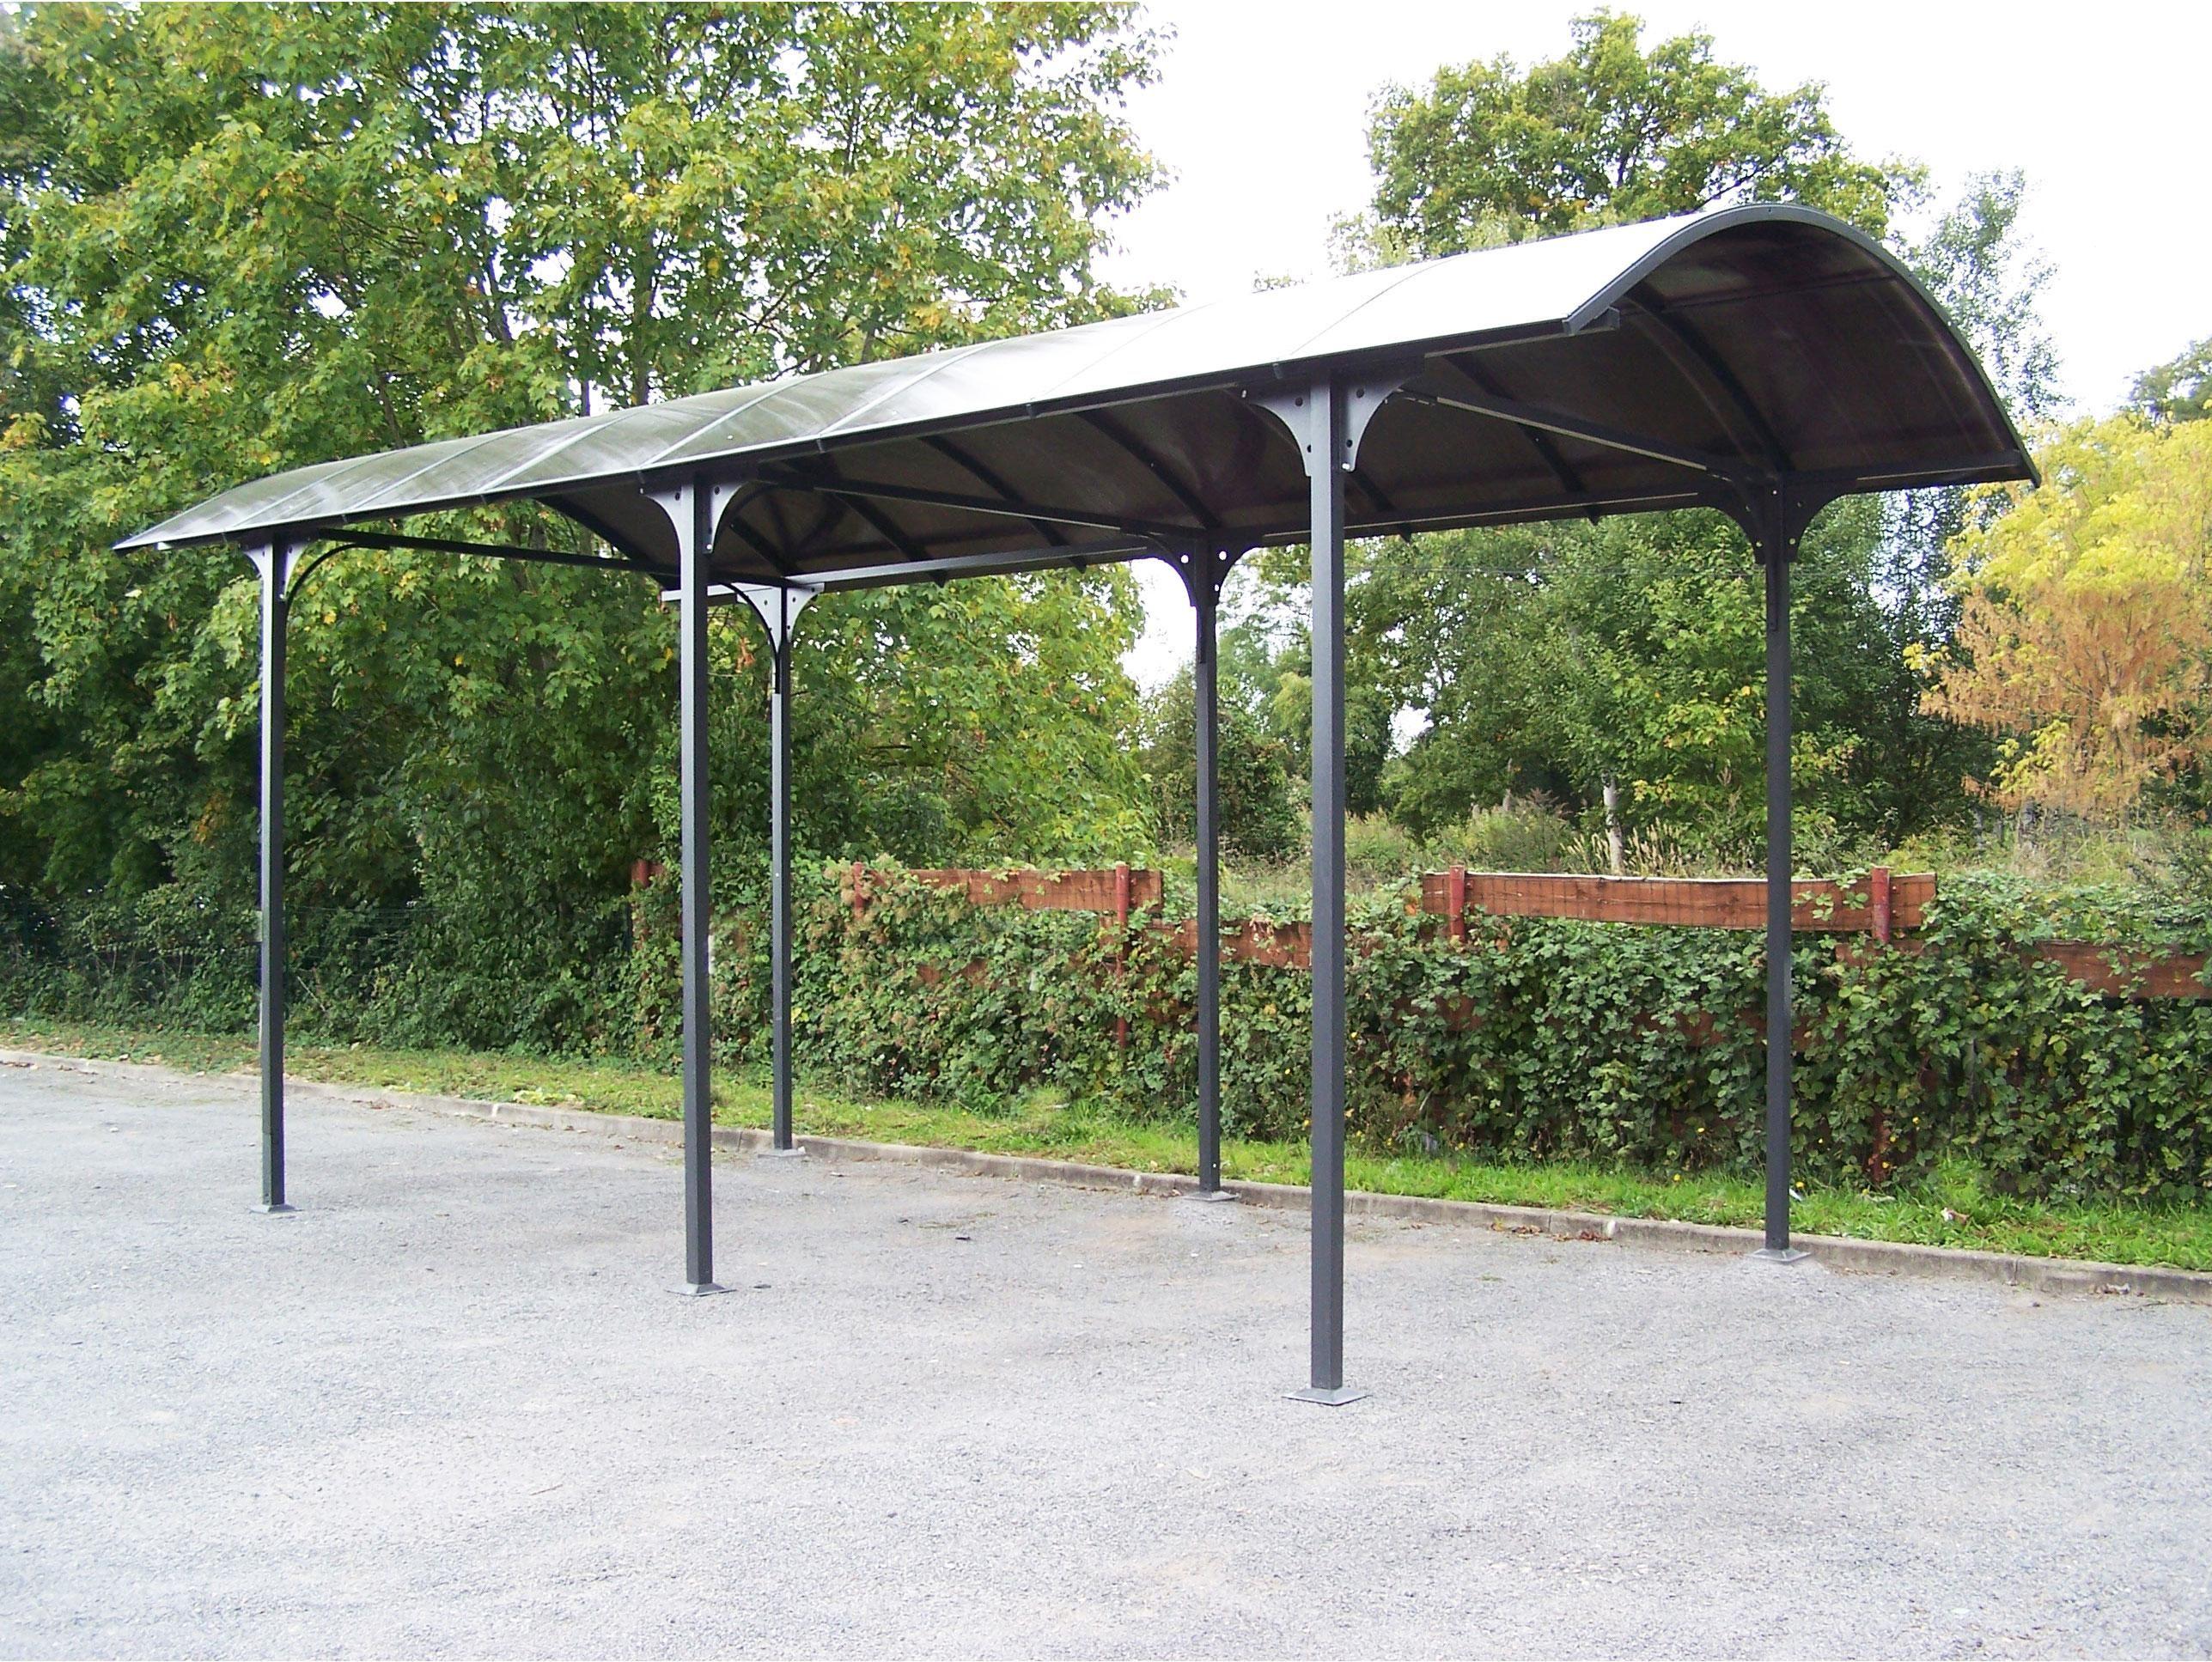 Carport Alu Habrita Car 3676 Alcc 27 51 M Long 765 X Larg 362 X H296 360 Cm En 2021 Abri Camping Car Ports De Voiture Carport Alu